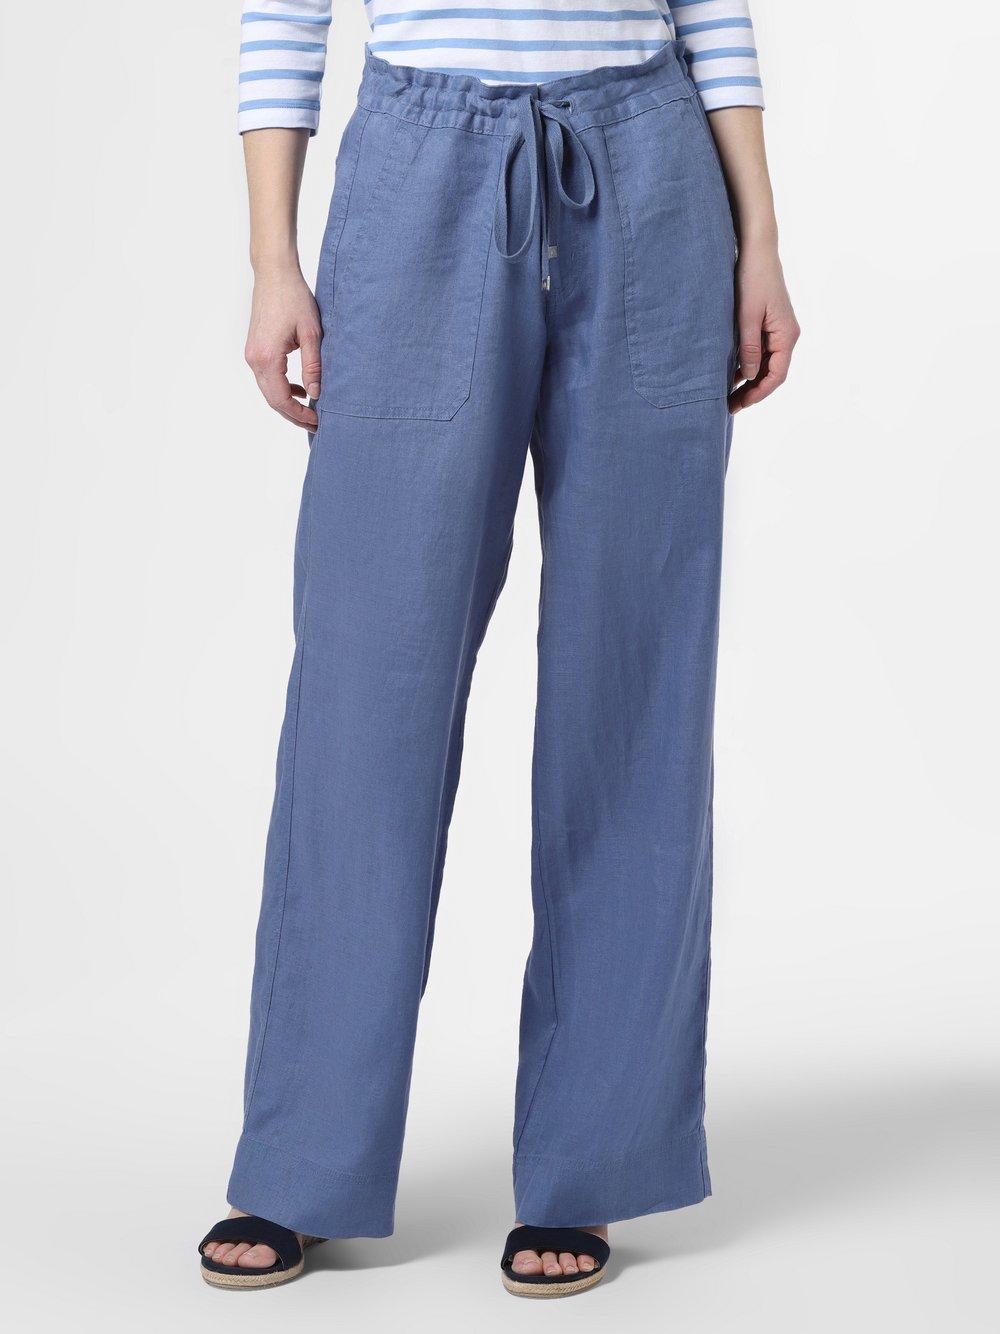 Lauren Ralph Lauren - Damskie spodnie lniane, niebieski